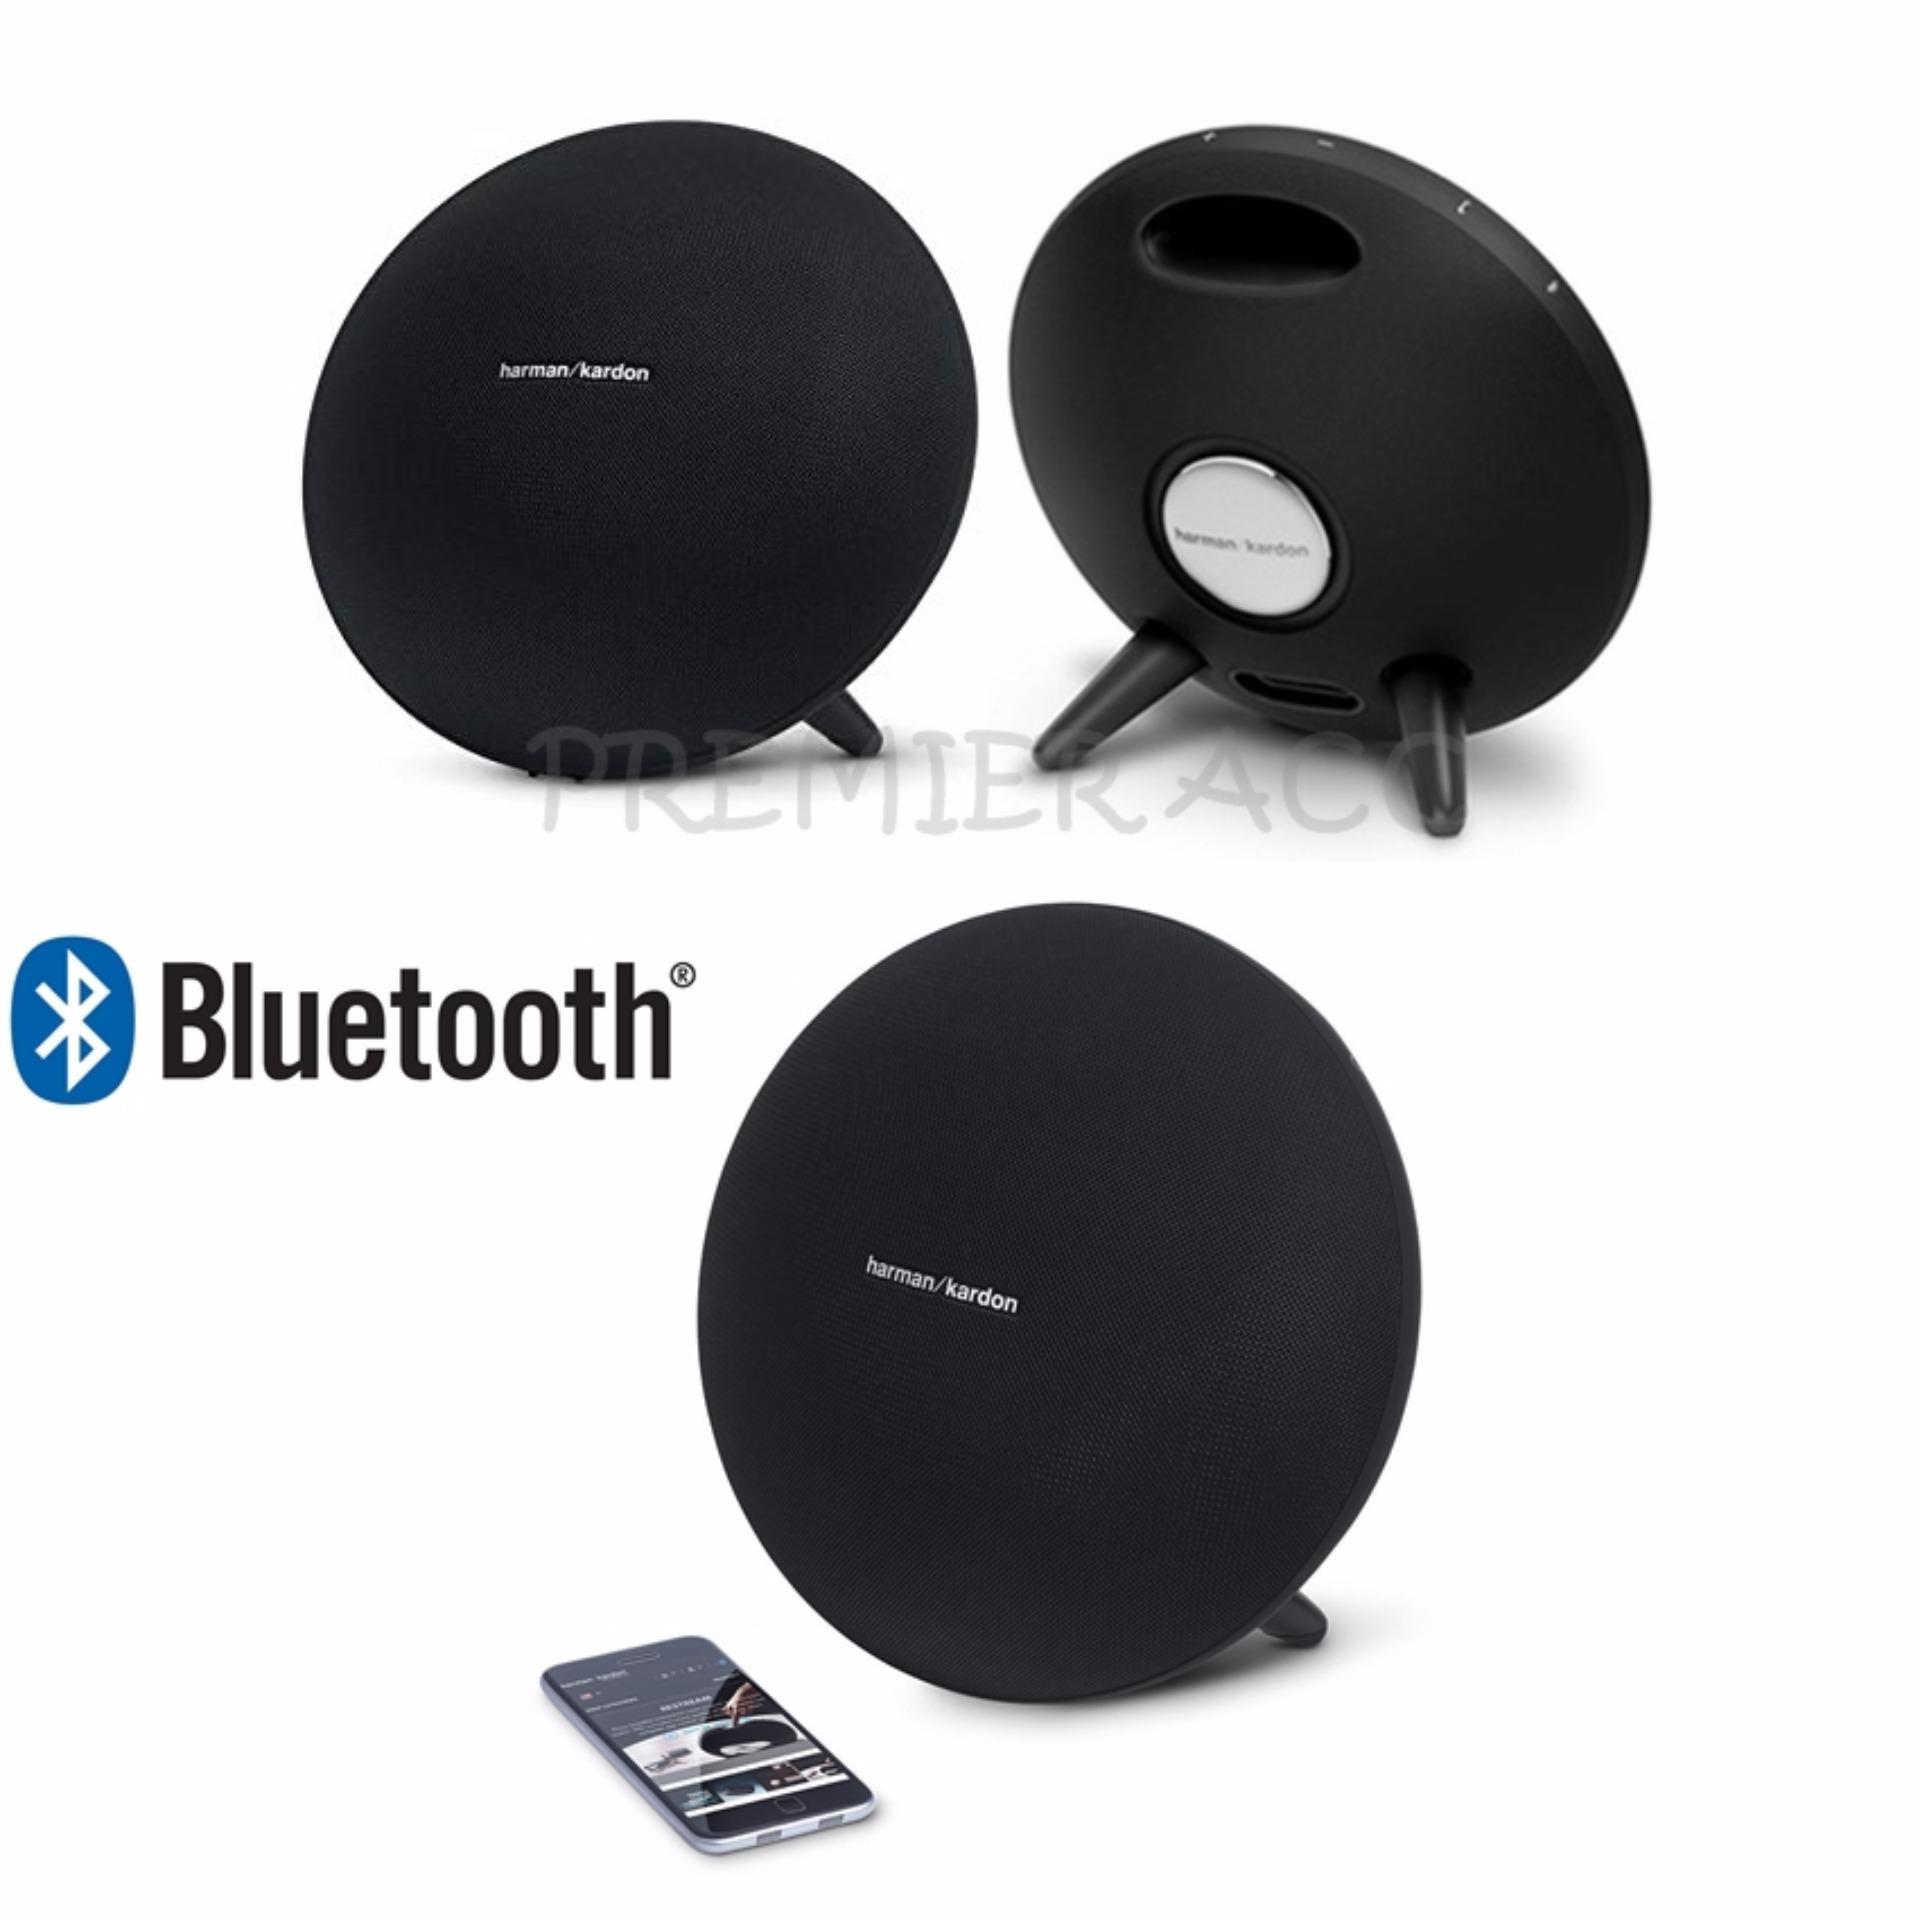 Harman Kardon Onyx 3 Speaker Bluetooth Portable Rechargeable